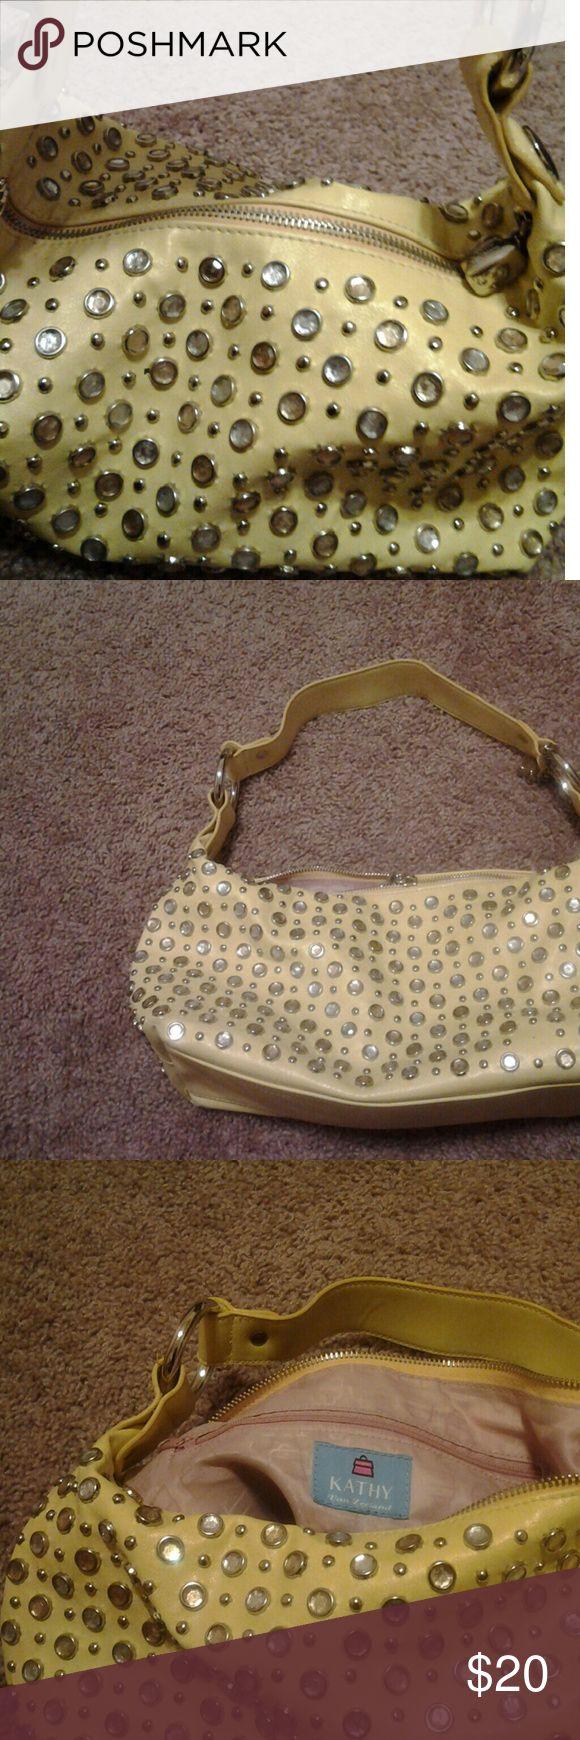 Kathy Van Zealand Yellow studded purse Kathy Van Zealand Yellow studded purse Bags Shoulder Bags